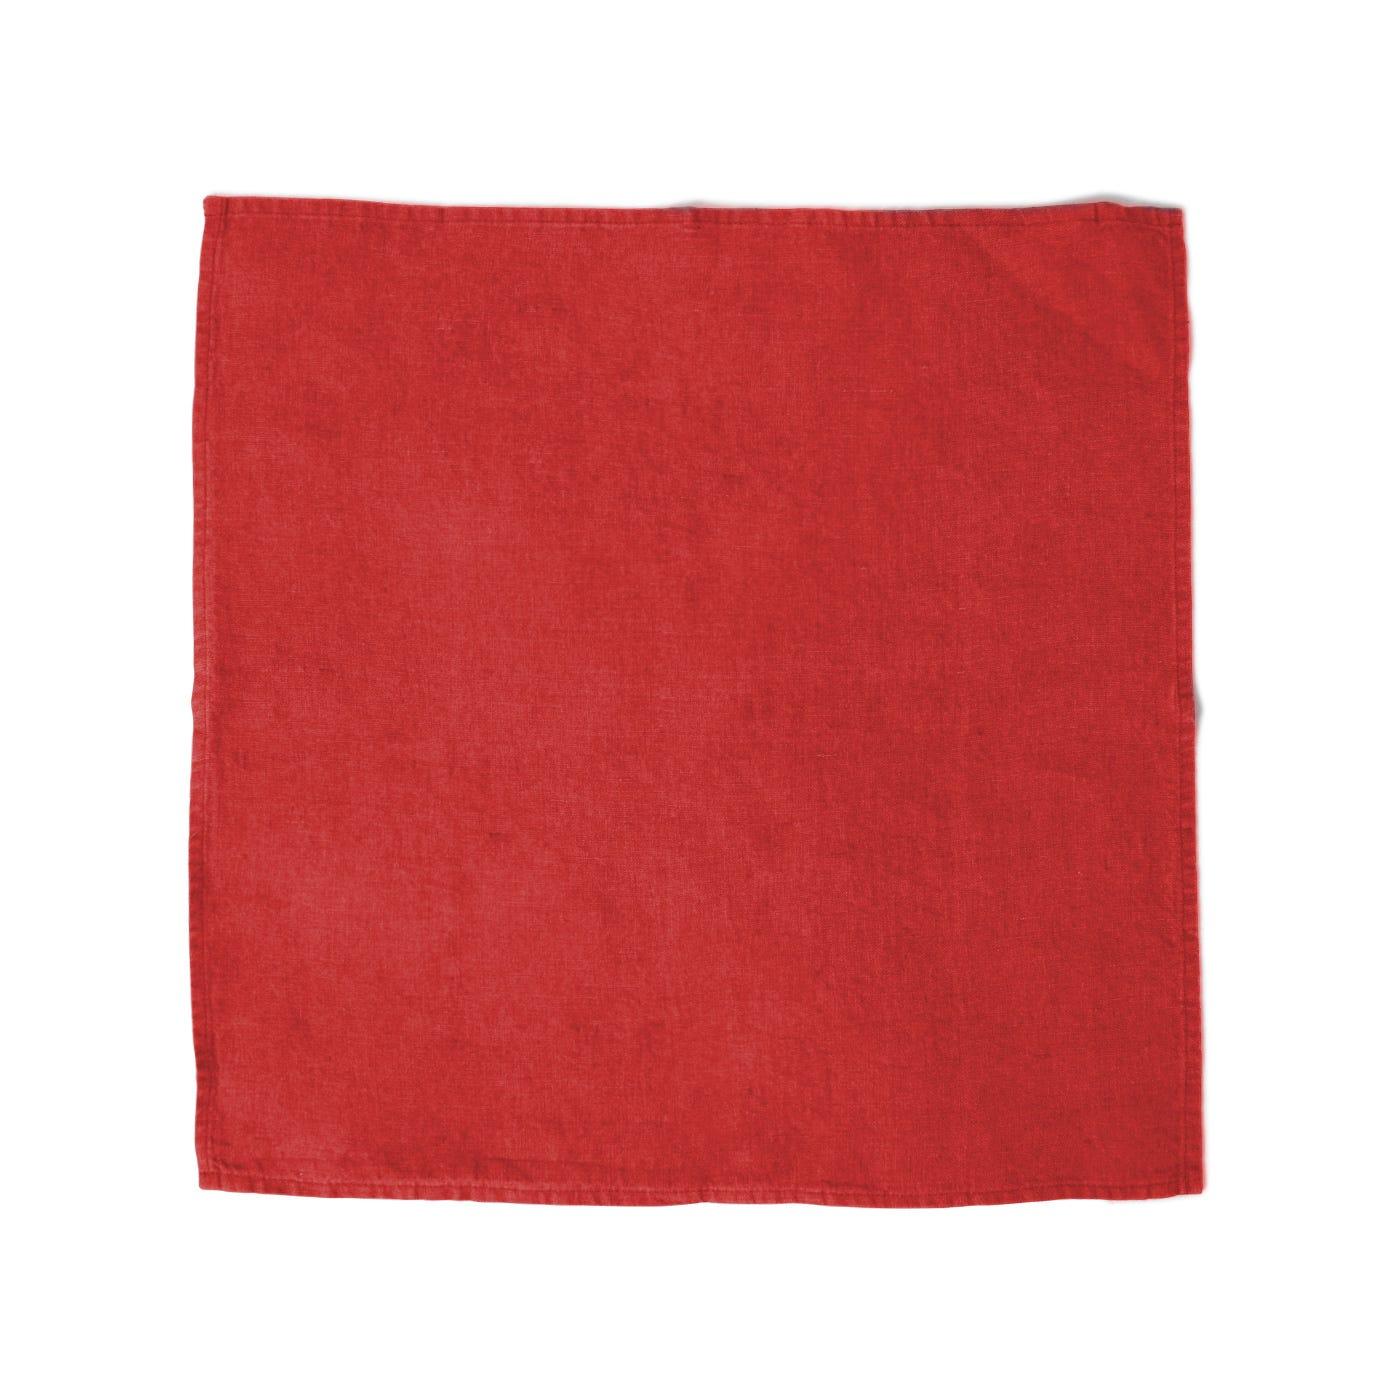 Heal's Linen Napkin Red